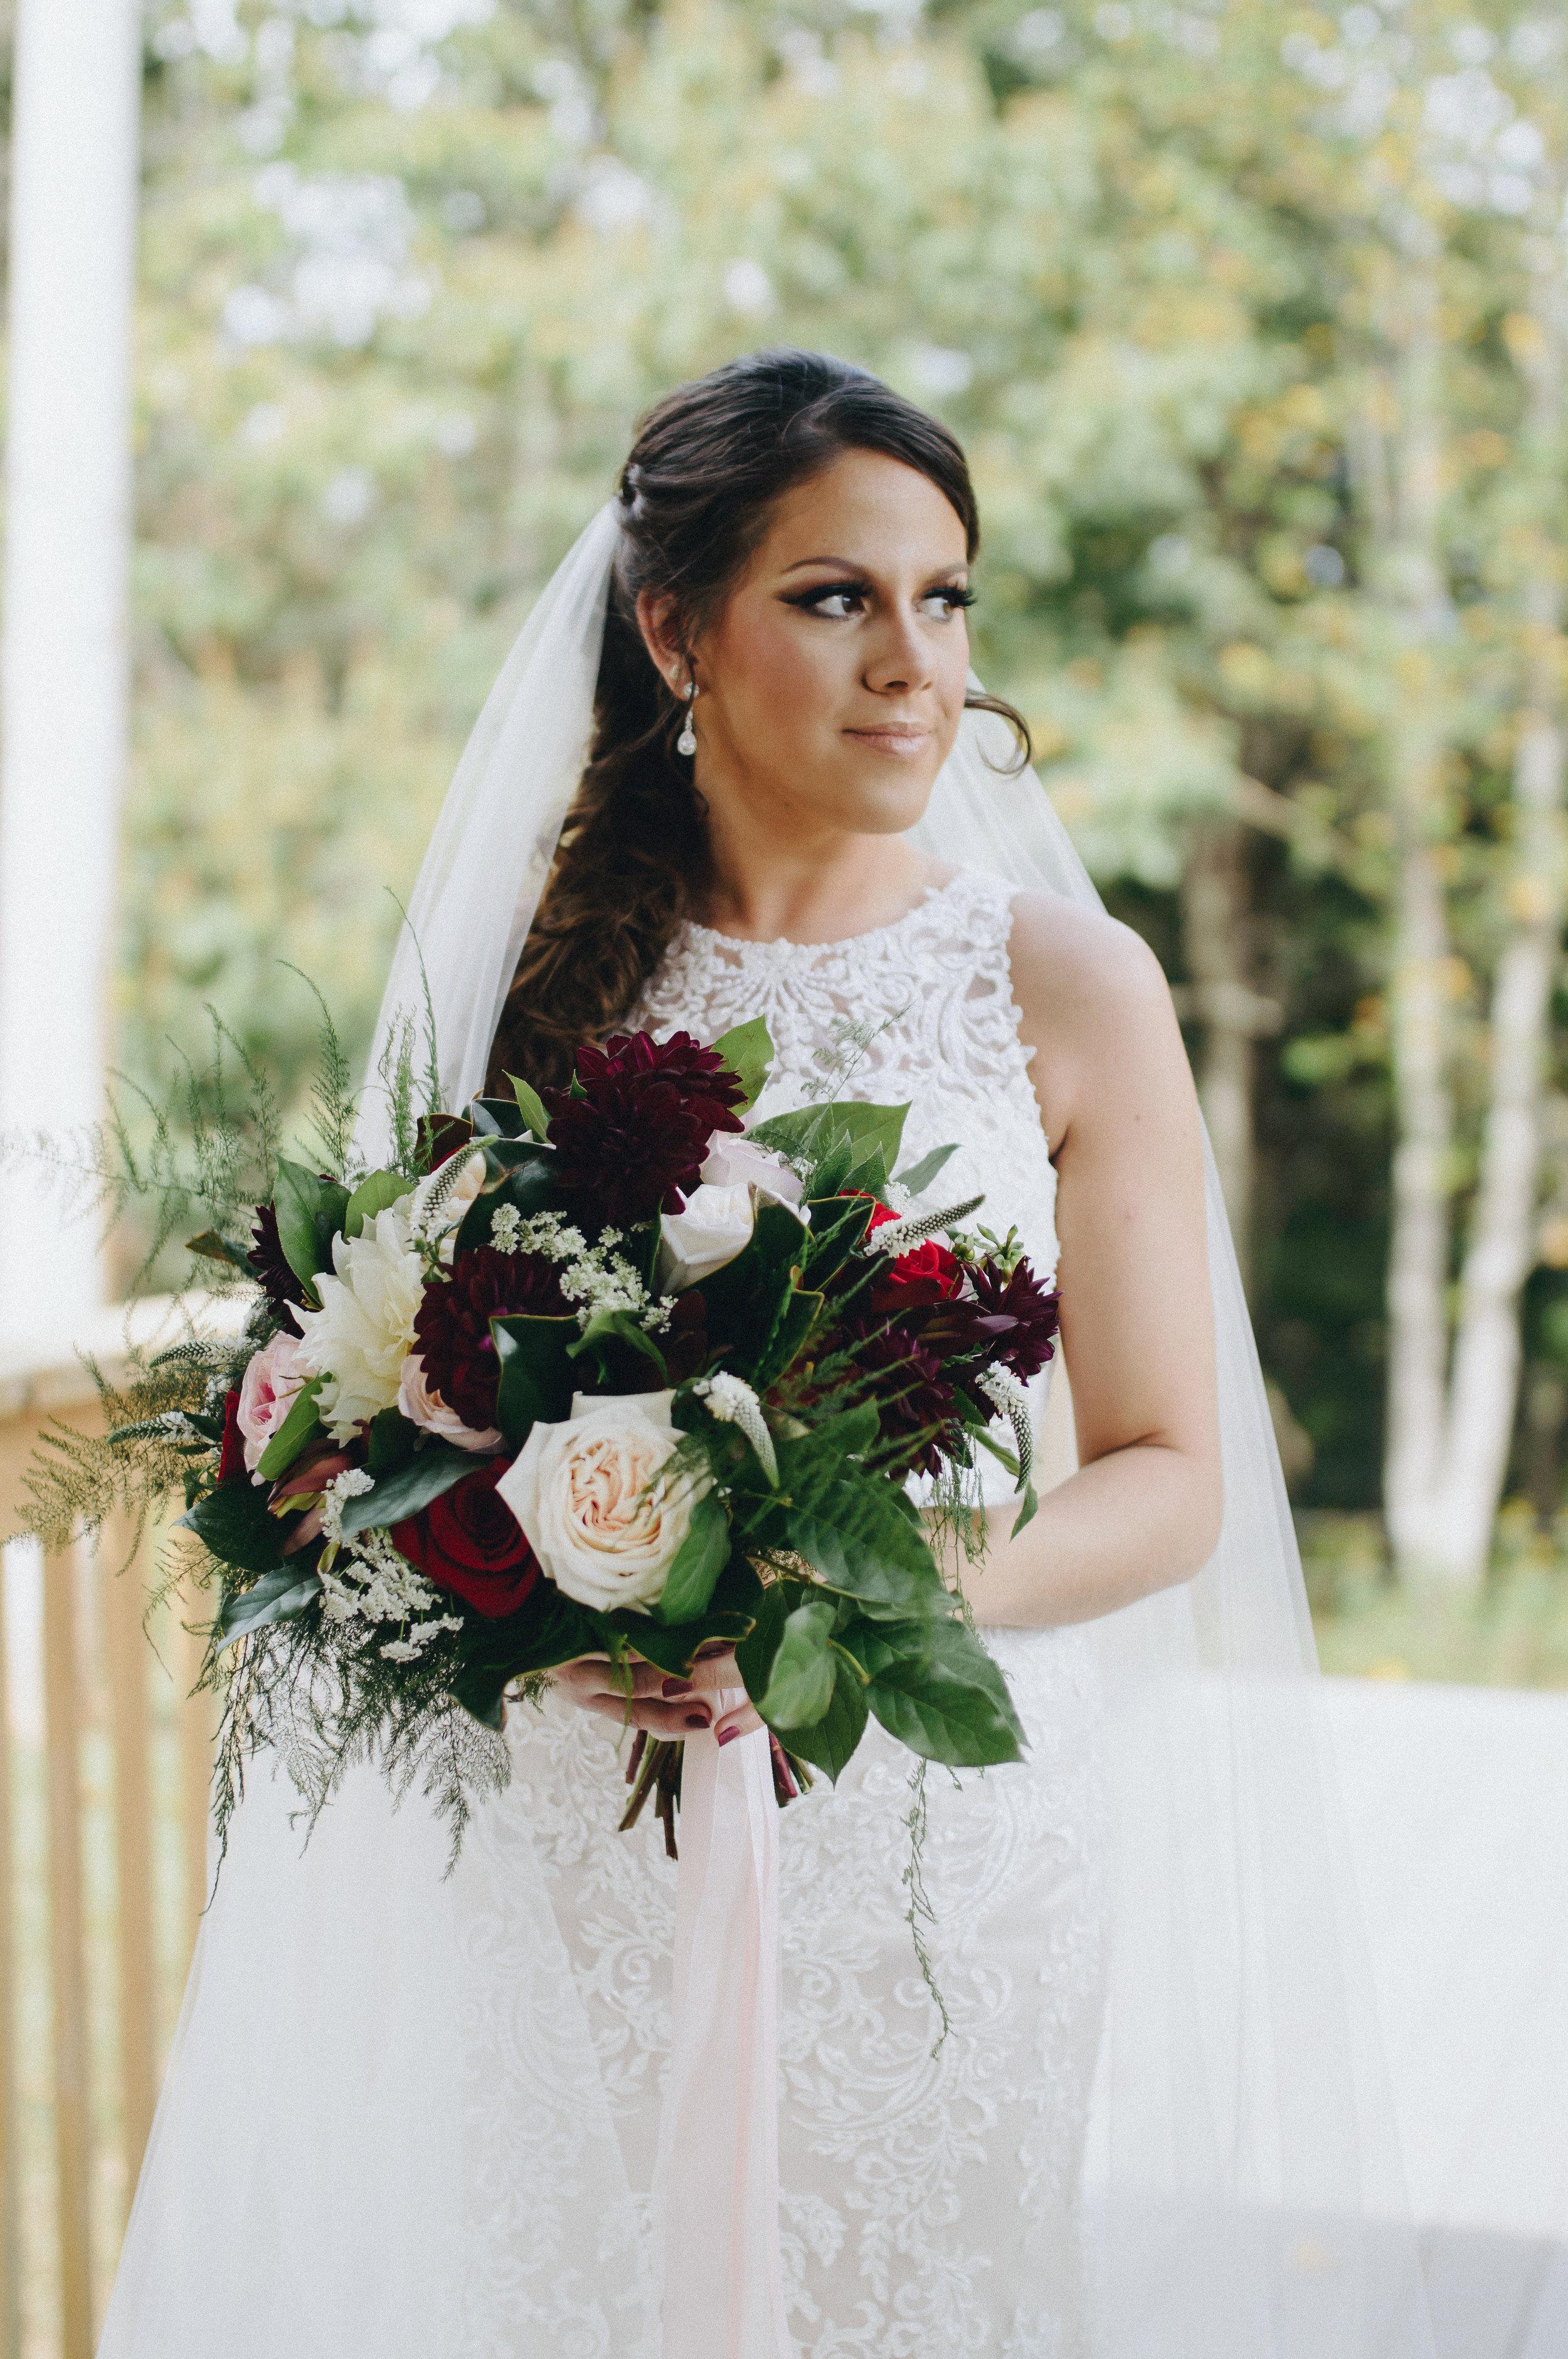 Lauren_Dustin_Wedding - EDITS-1.jpg